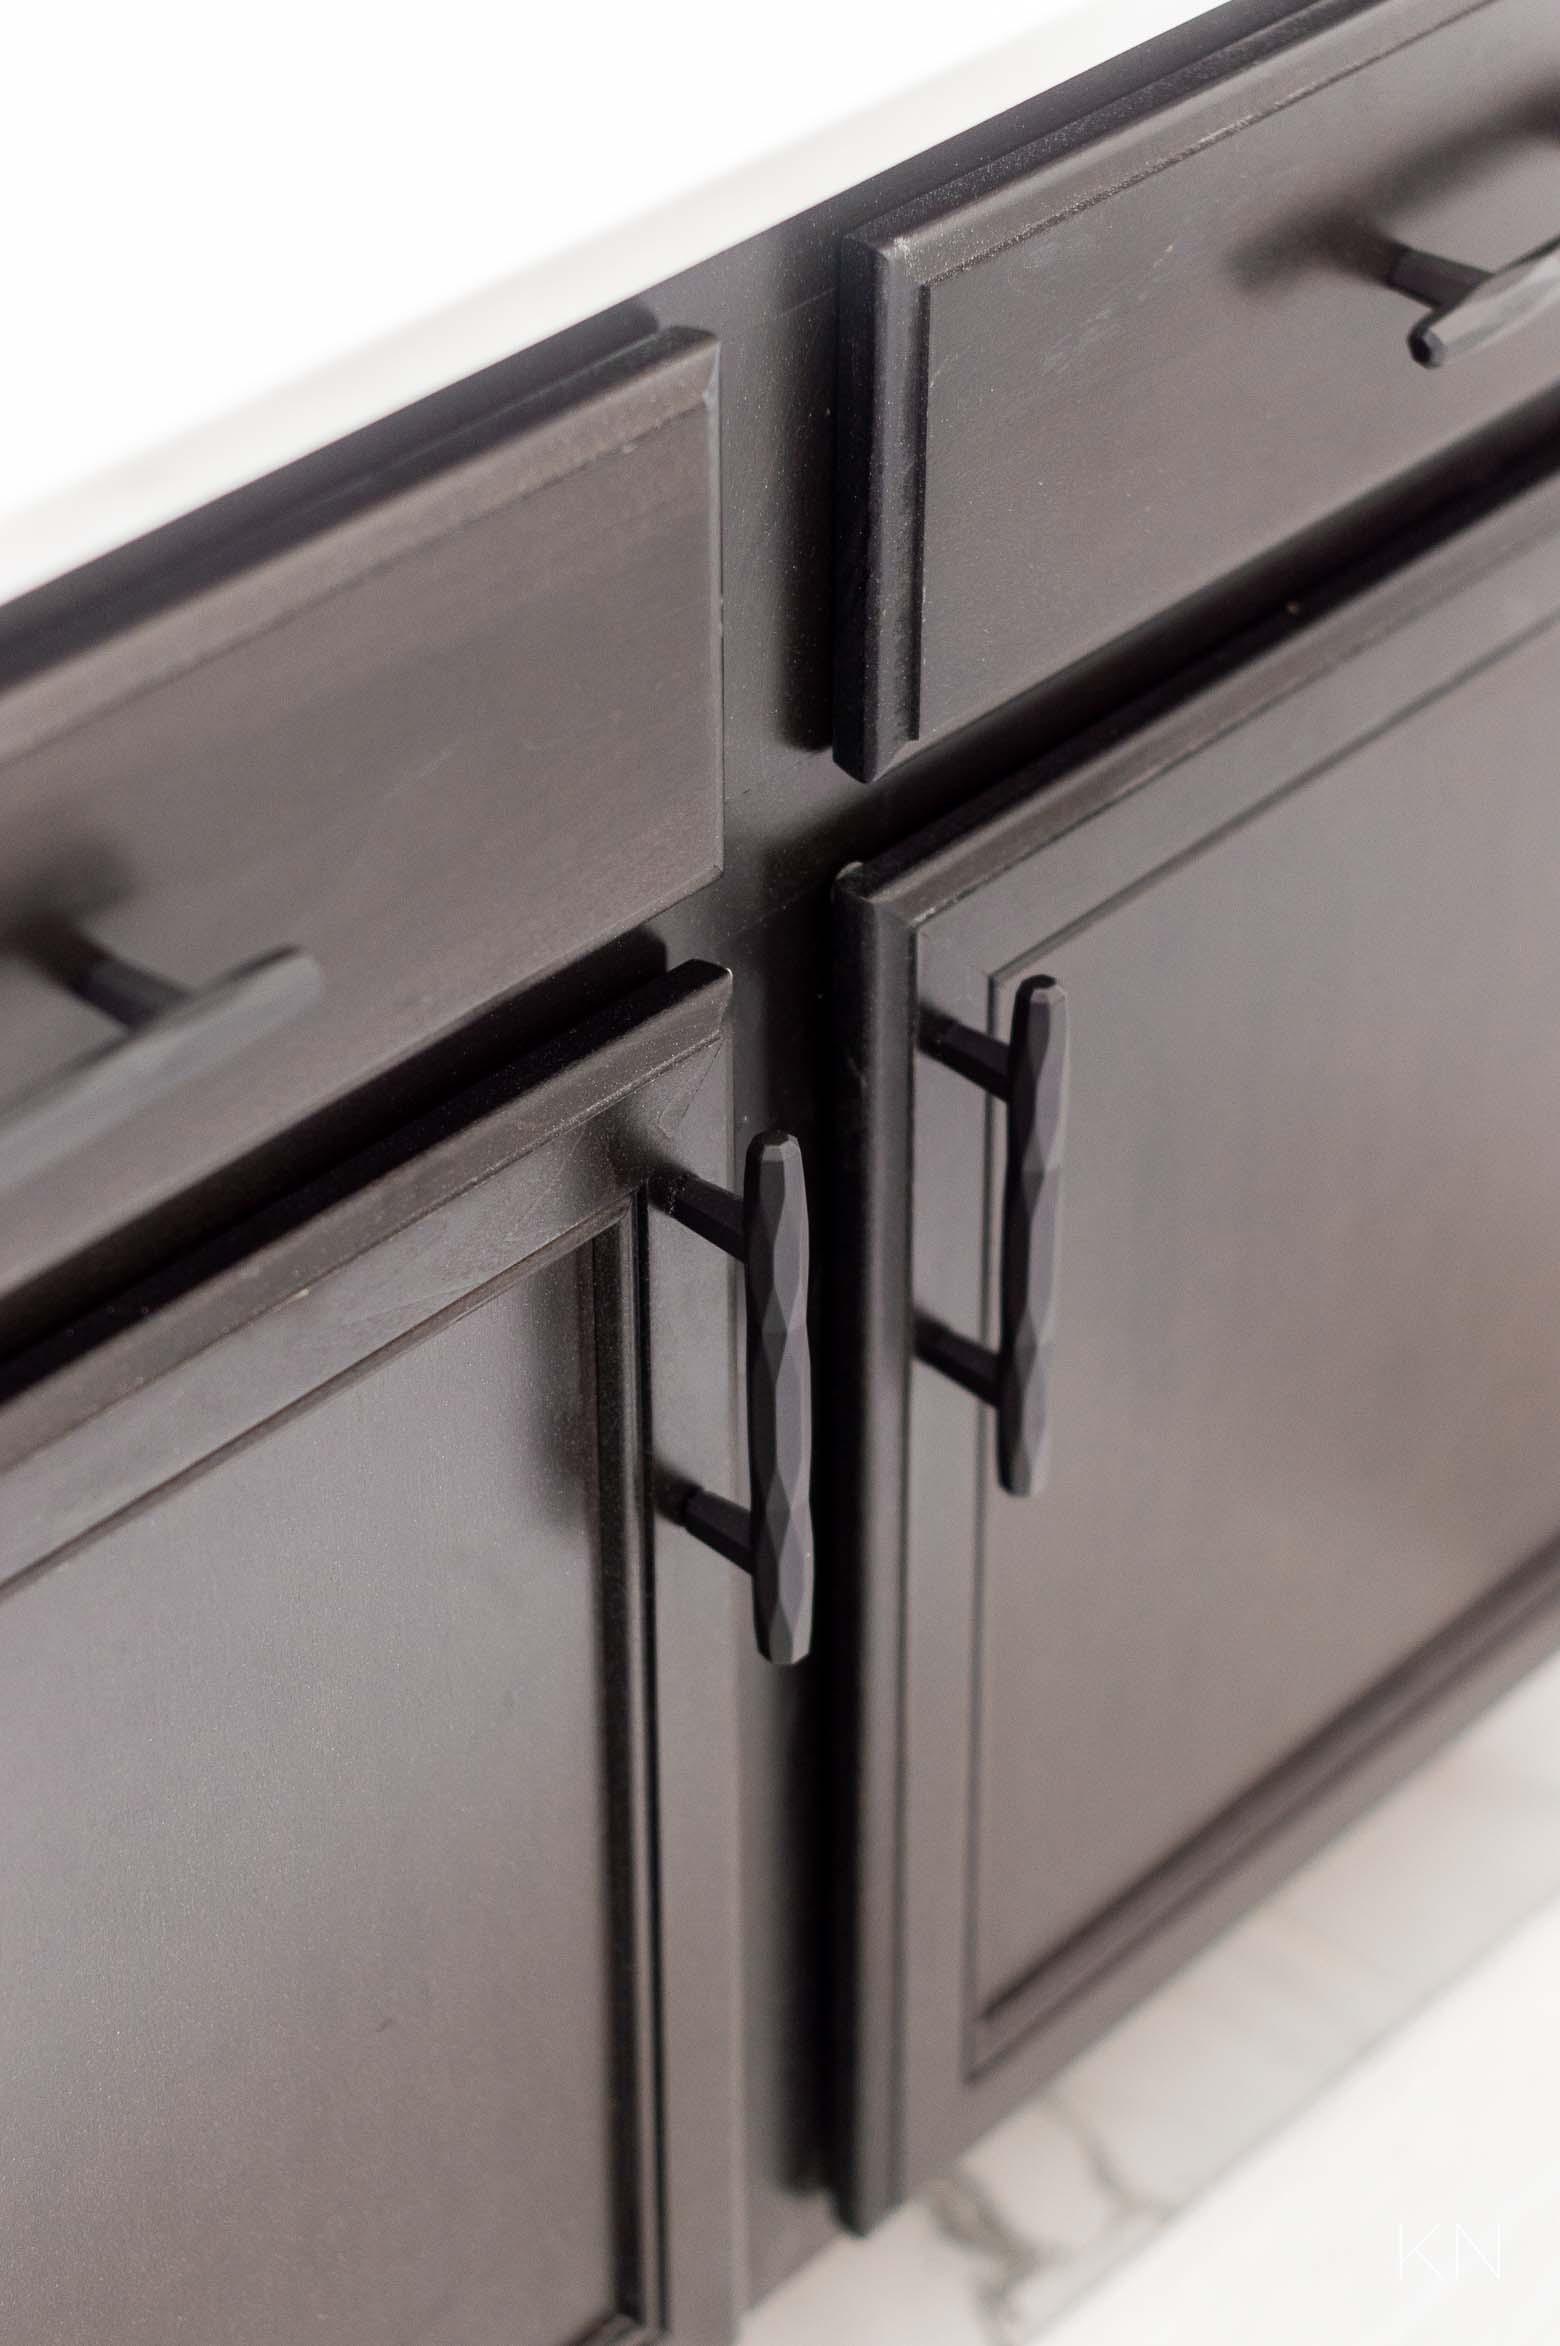 Cabinet Pulls & Other Easy Ways to Update a Builder Grade Kitchen